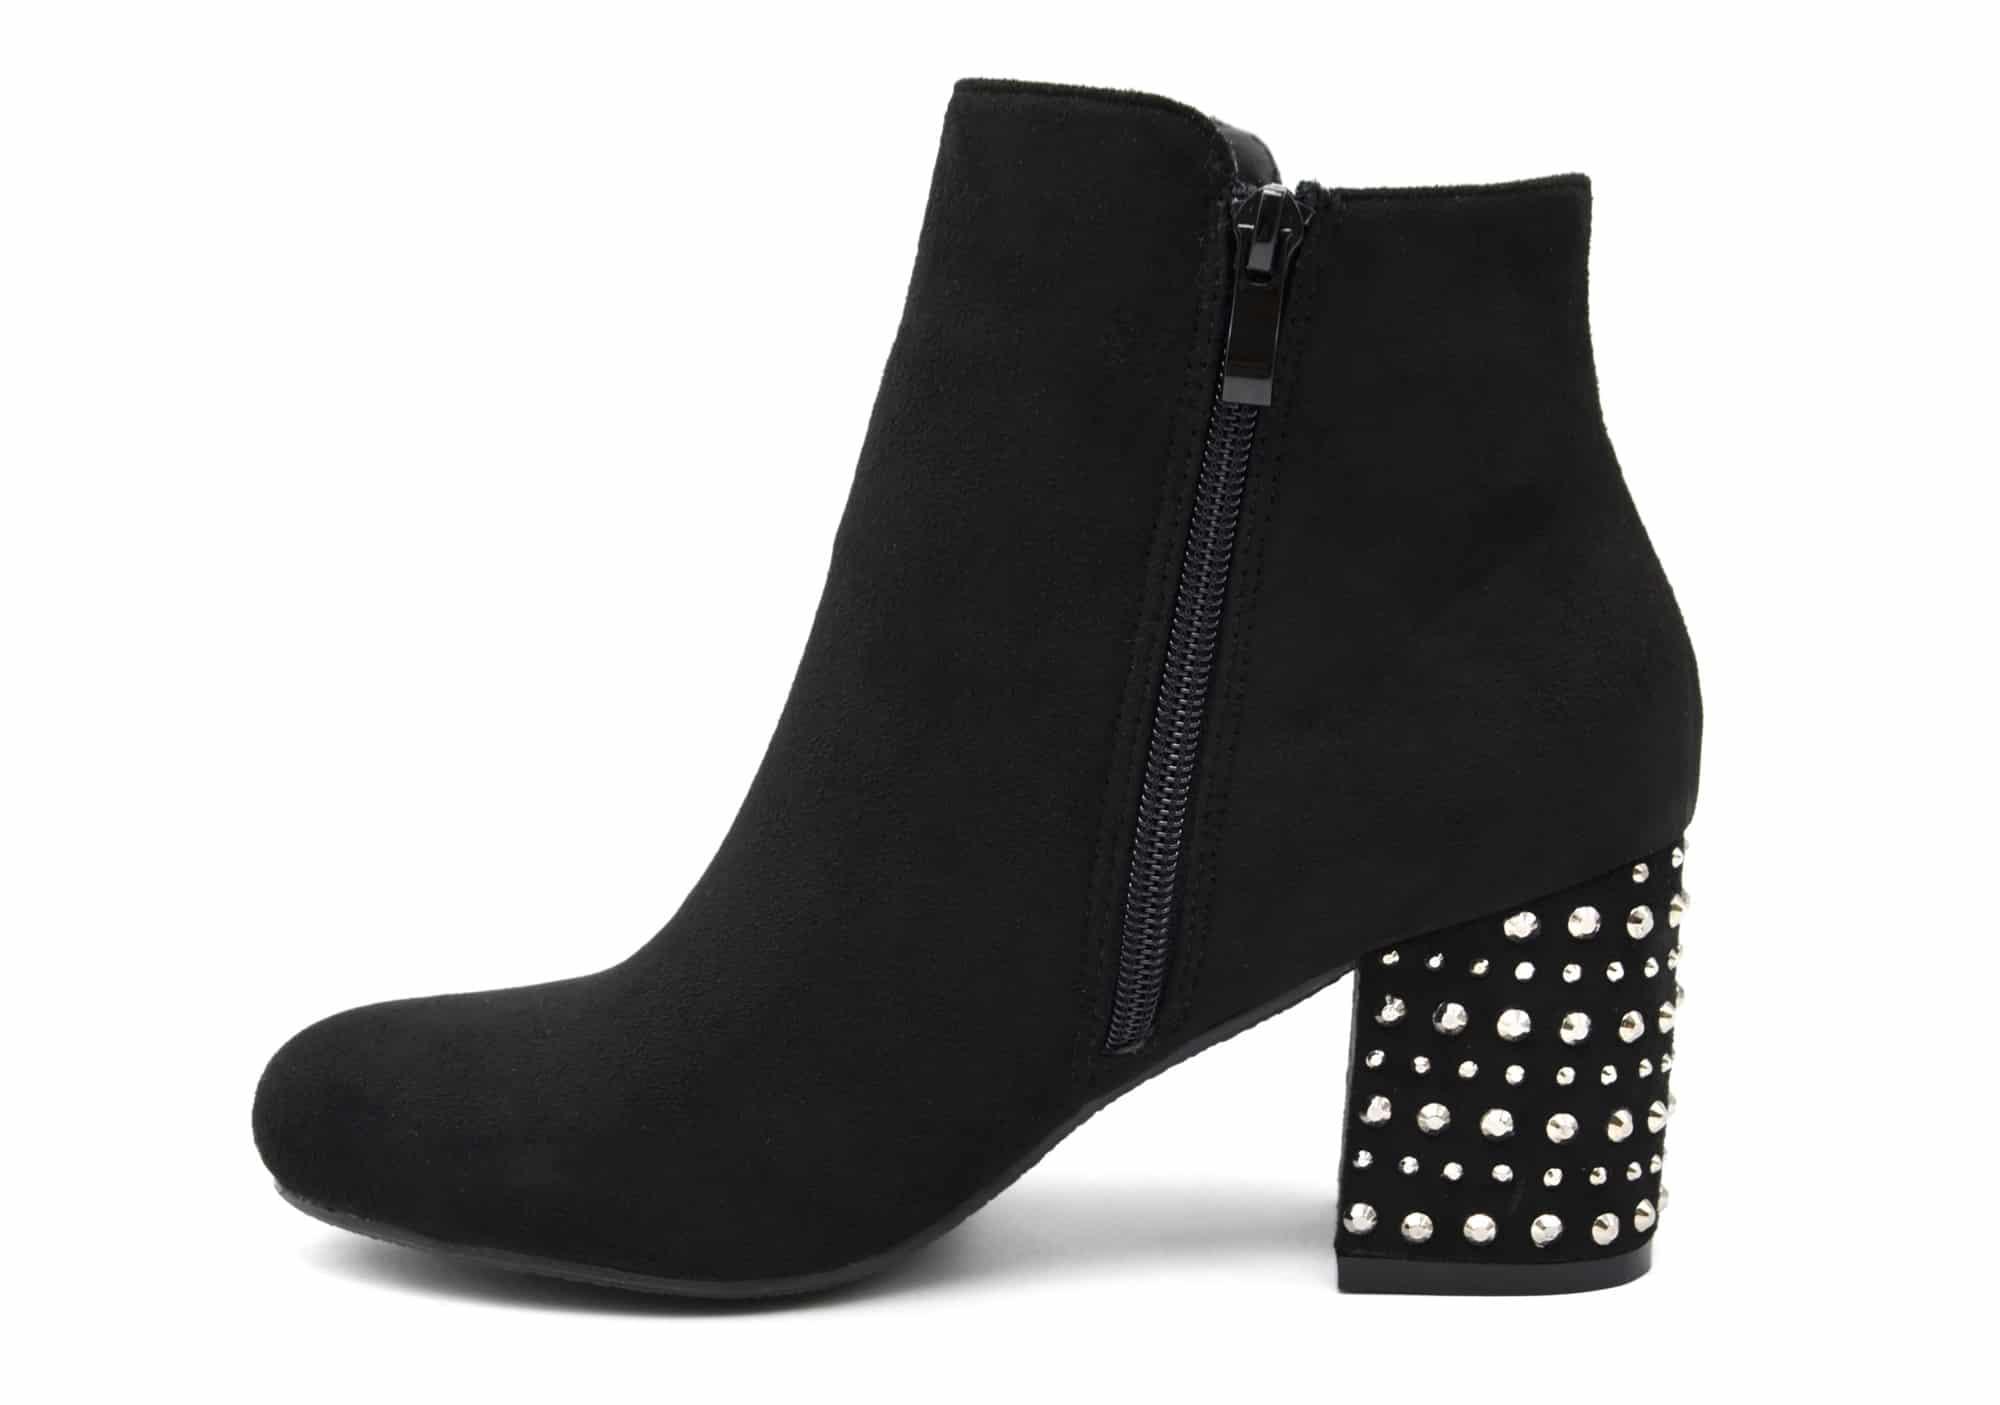 shf93 bottines boots effet daim avec talon carr orn de. Black Bedroom Furniture Sets. Home Design Ideas